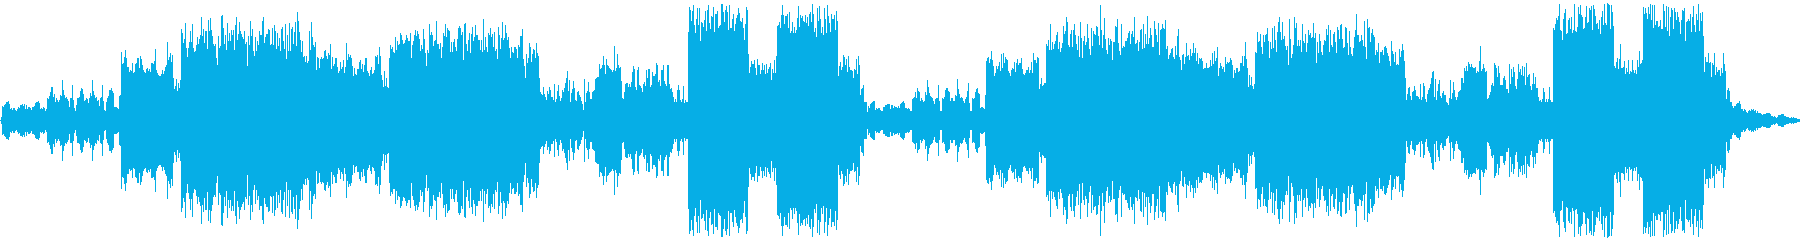 8bit・ピアノ・ラスボス・戦闘・女王の再生済みの波形